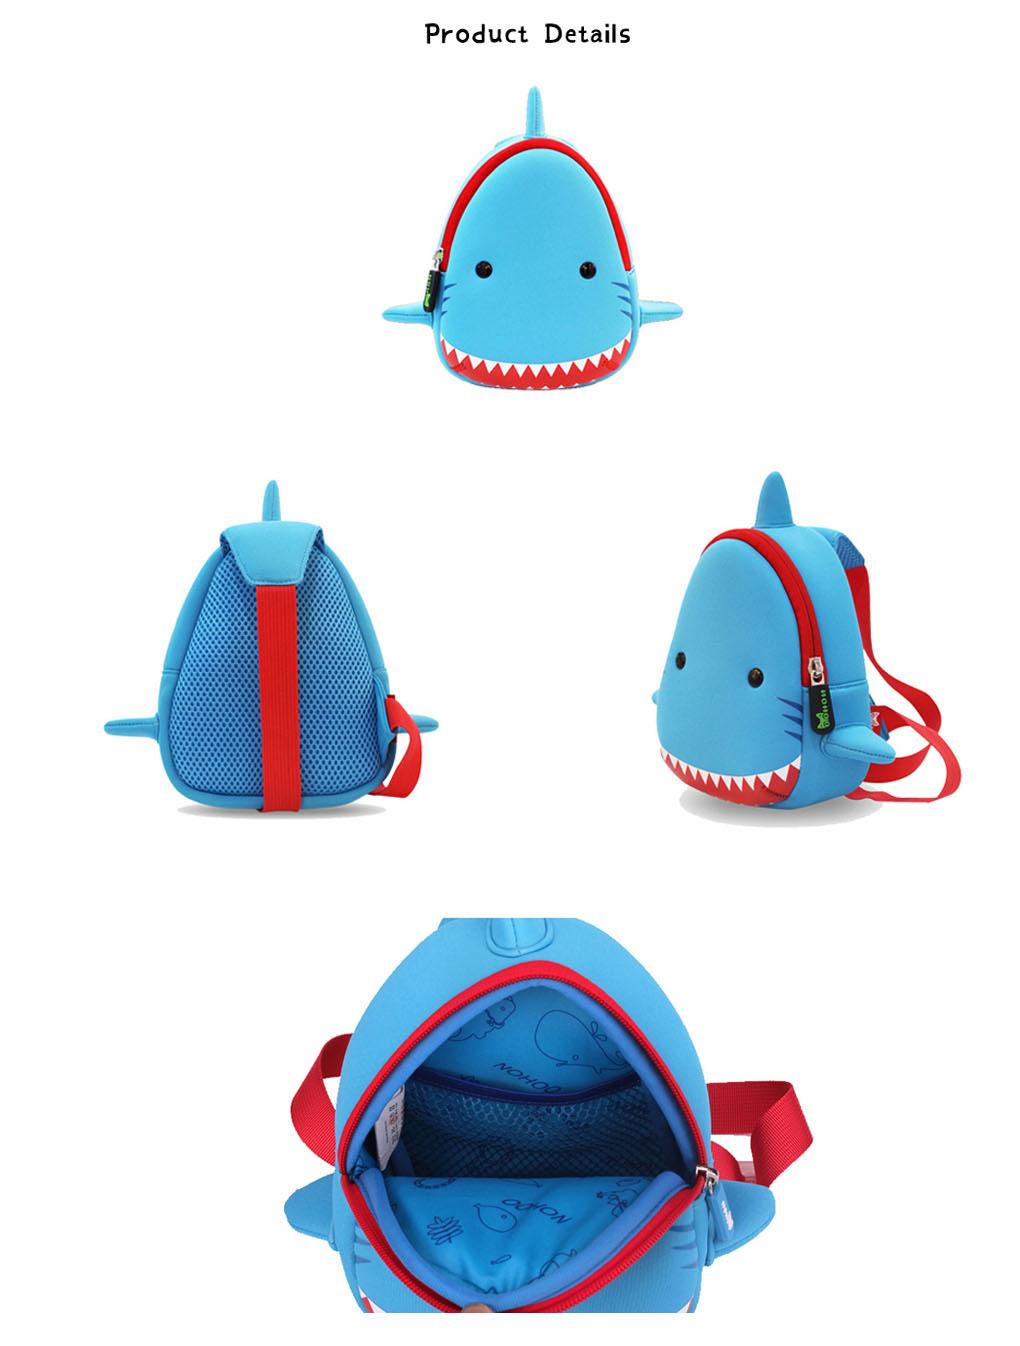 Nohoo Children Products-Ultralight Durable Outdoor Animal Bag Mini Chest Bag For Kindergarten